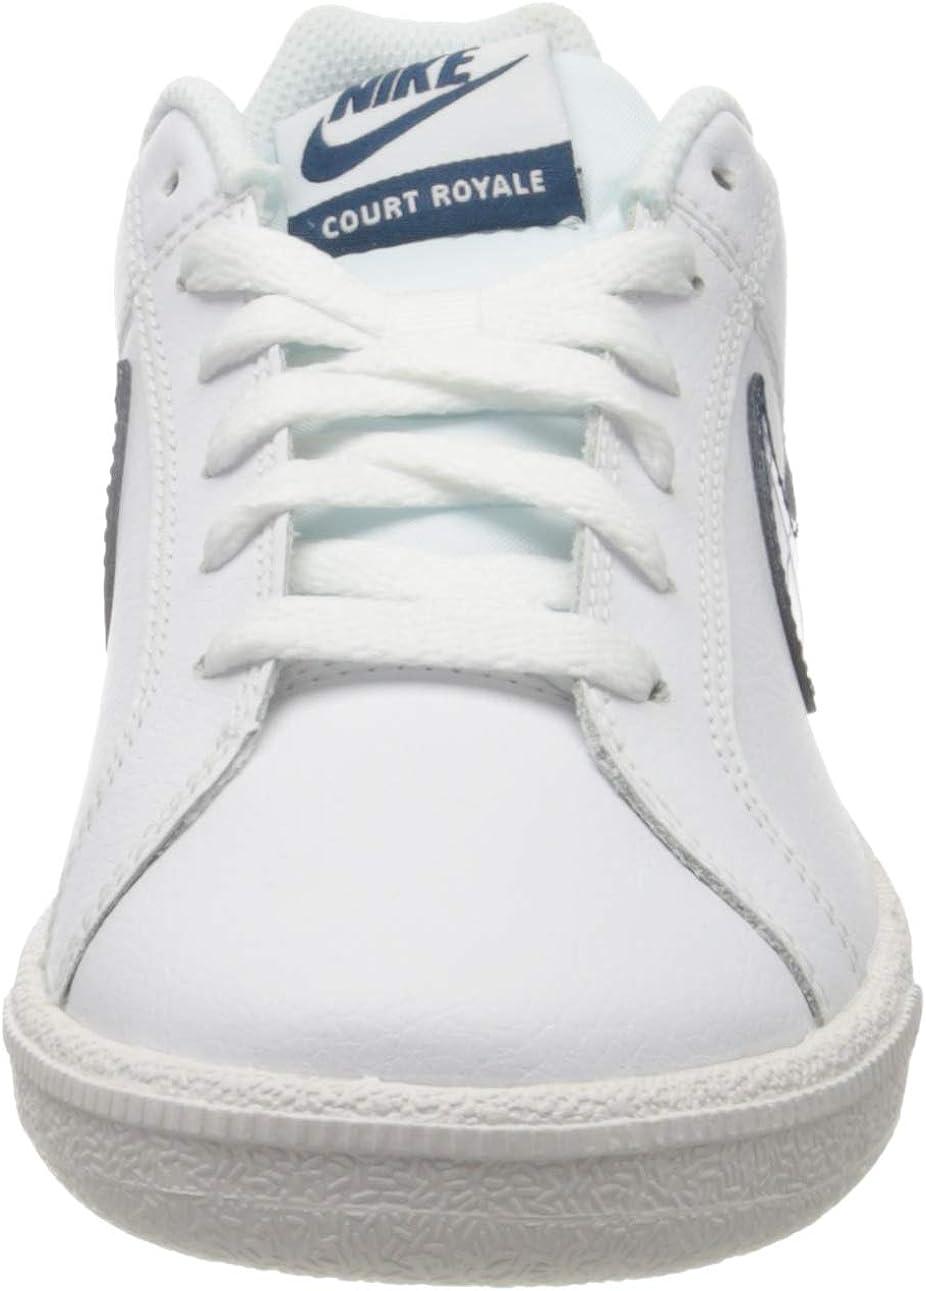 NIKE Court Royale, Zapatillas para Mujer Blanco Azul Valeriana